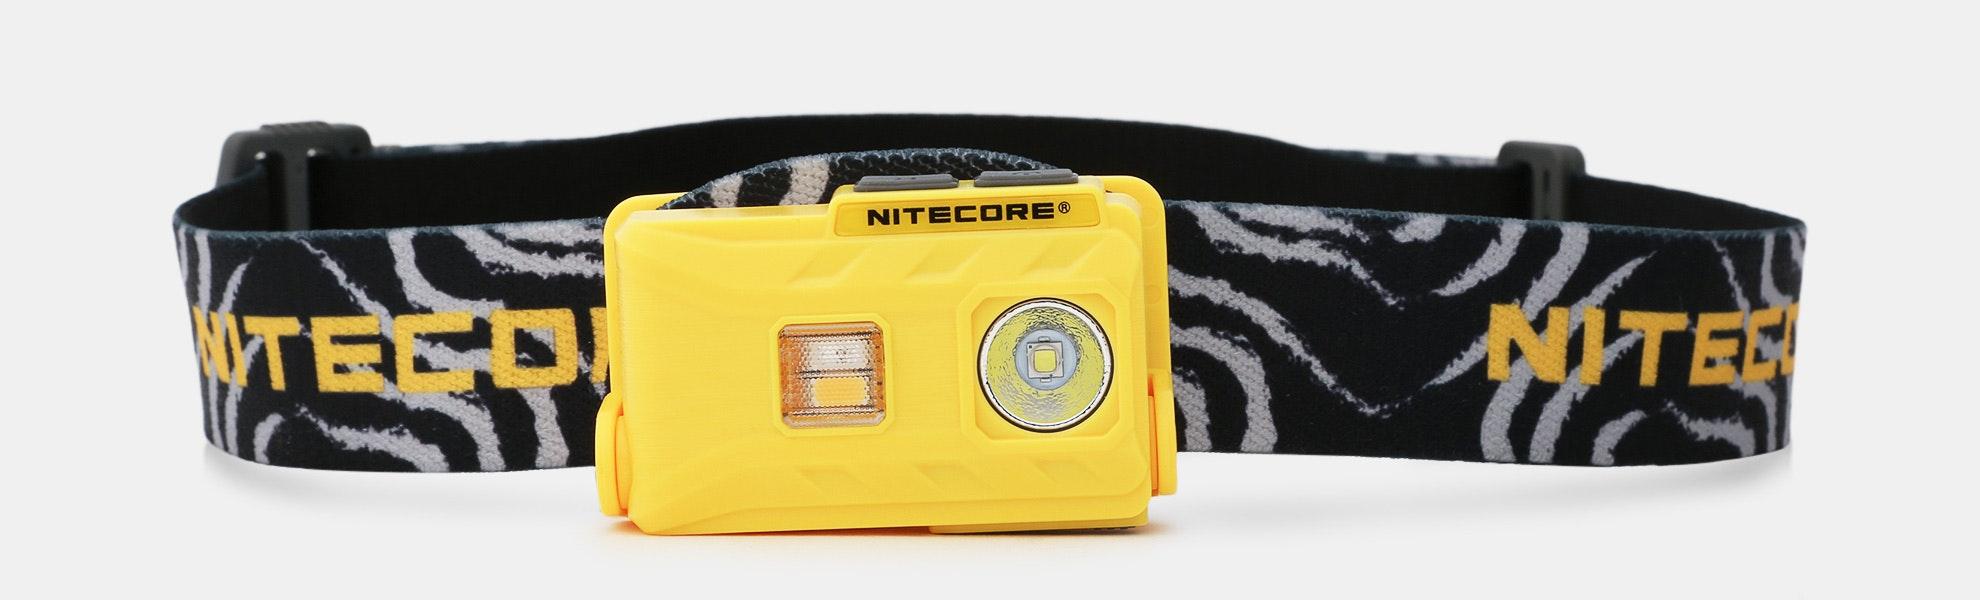 Nitecore NU25 360-Lumen Rechargeable Headlamp